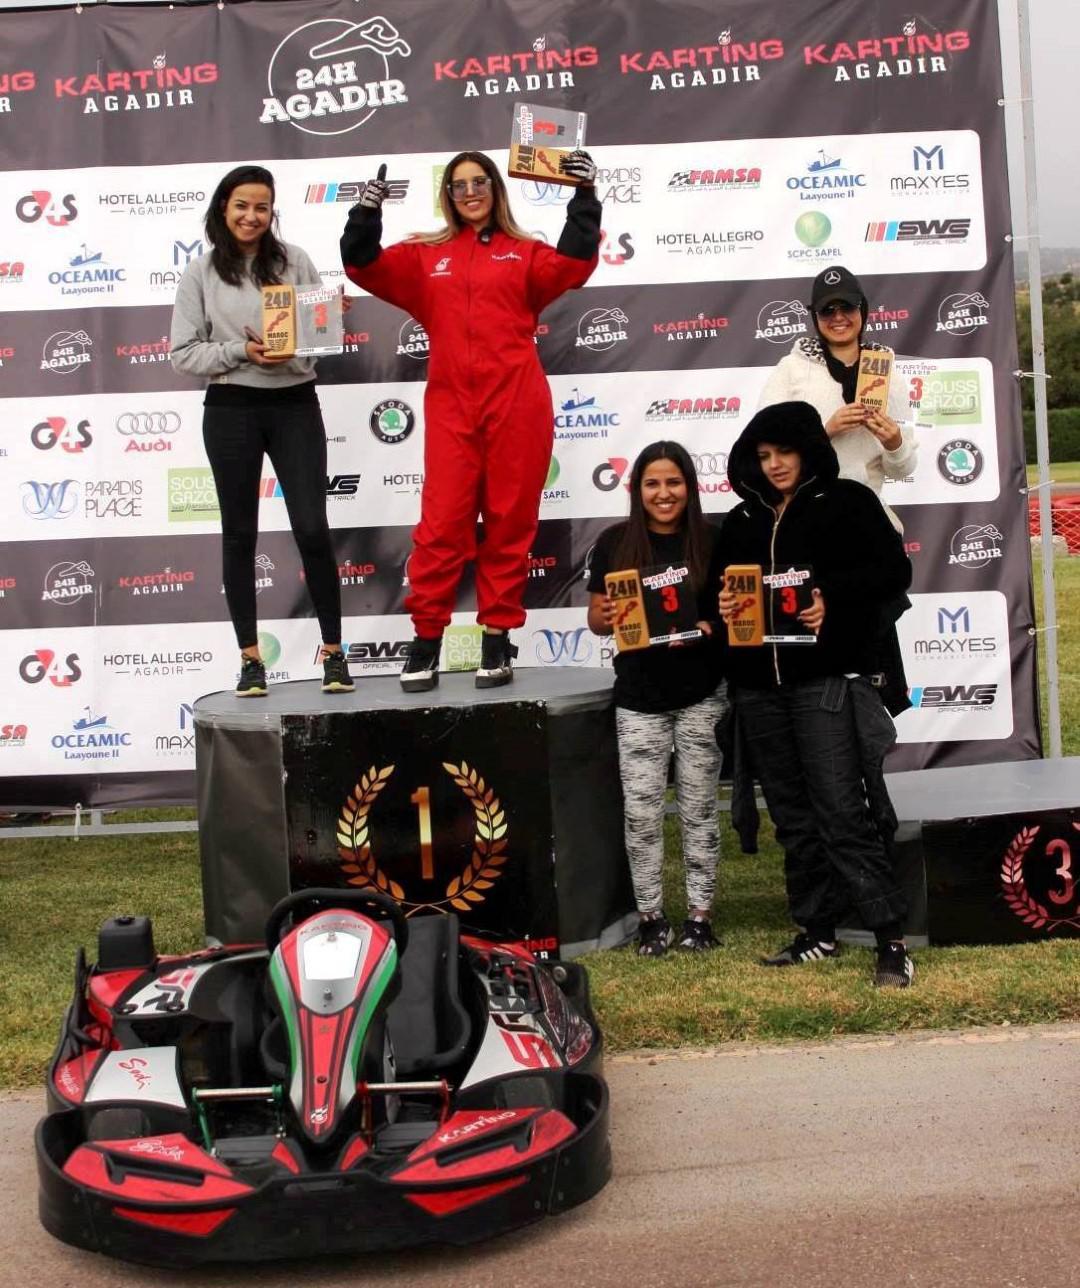 l-experience-des-24-heures-d-endurance-karting-d-agadir-927-13.jpg